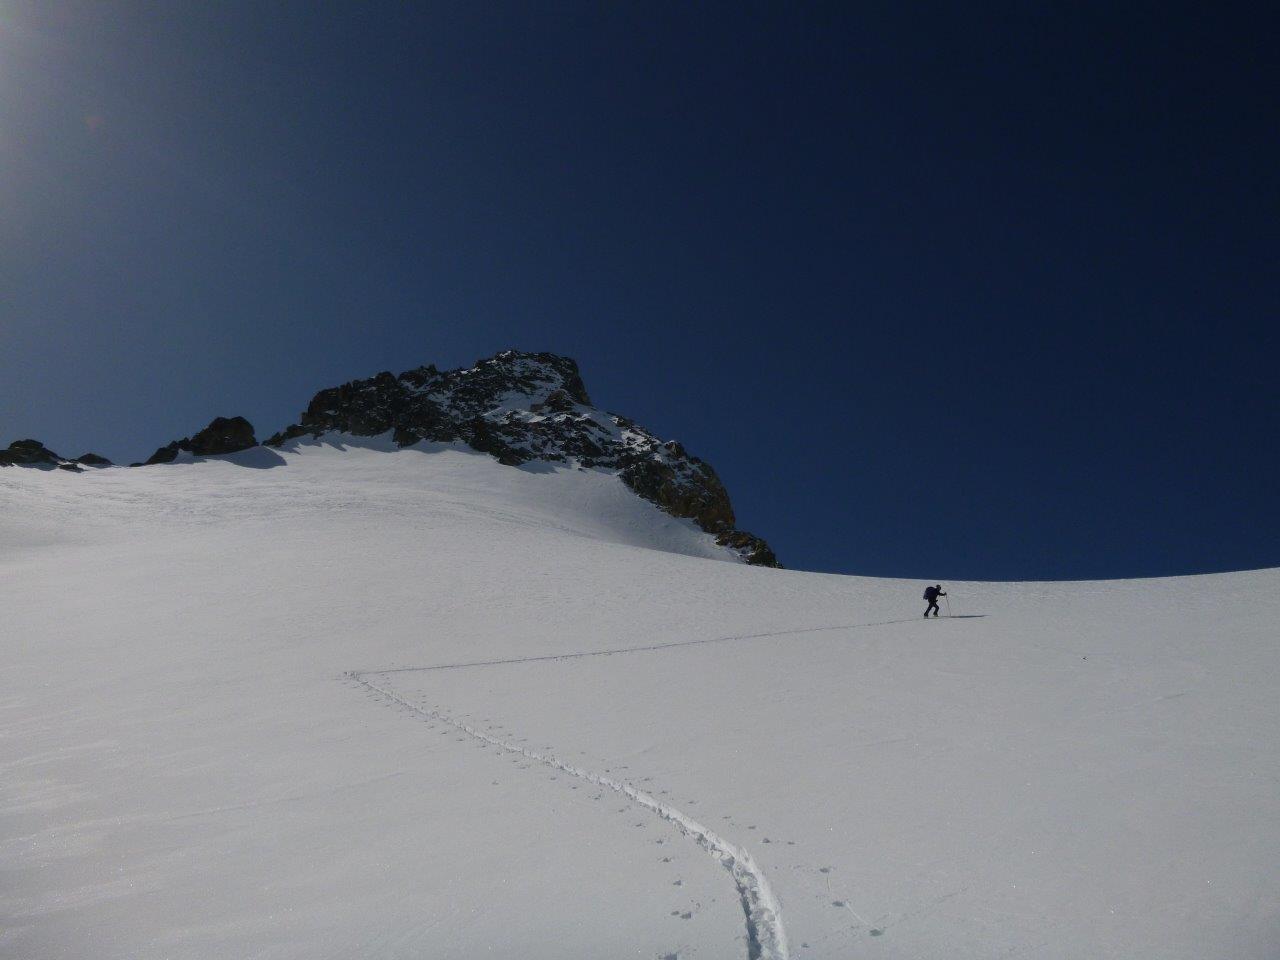 salita prima del colle mont gelé